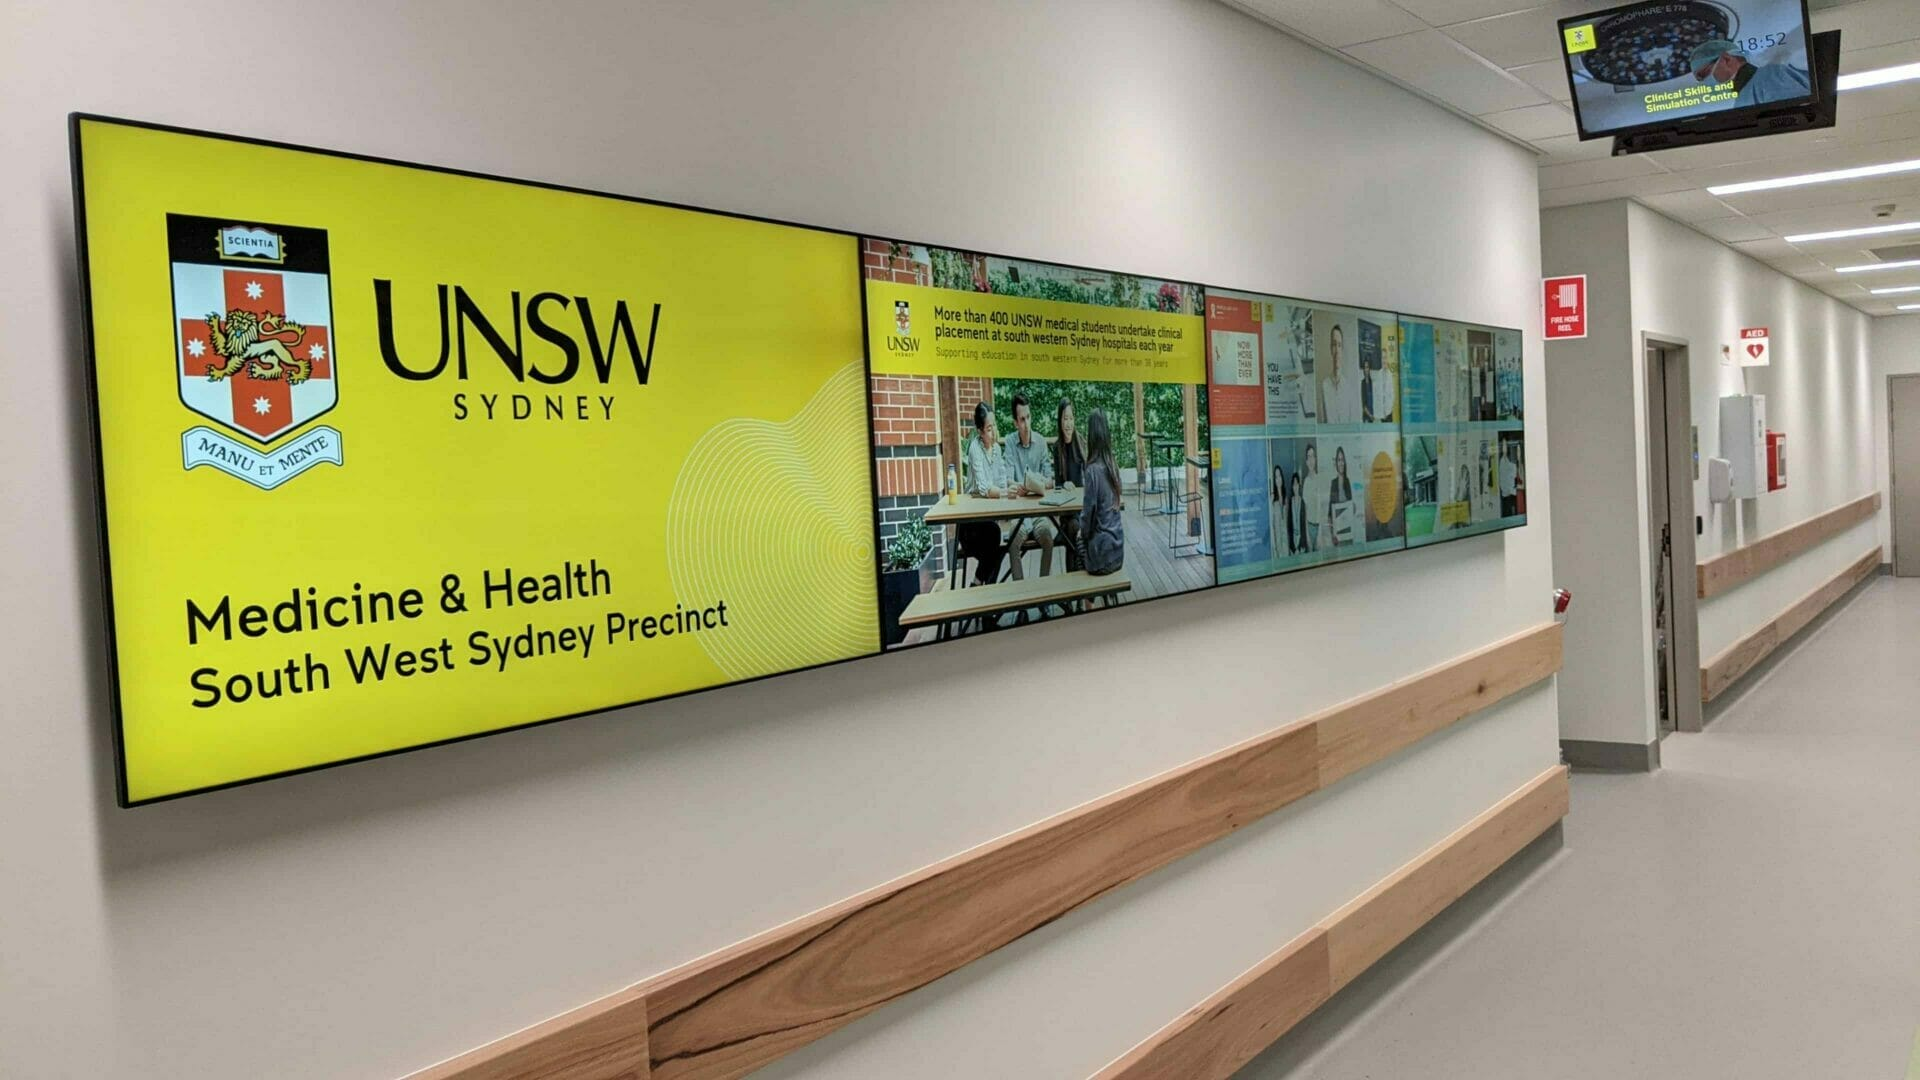 Advertise Me UNSW Medicine Health South West Sydney Precinct 4x1 Video Wall 1